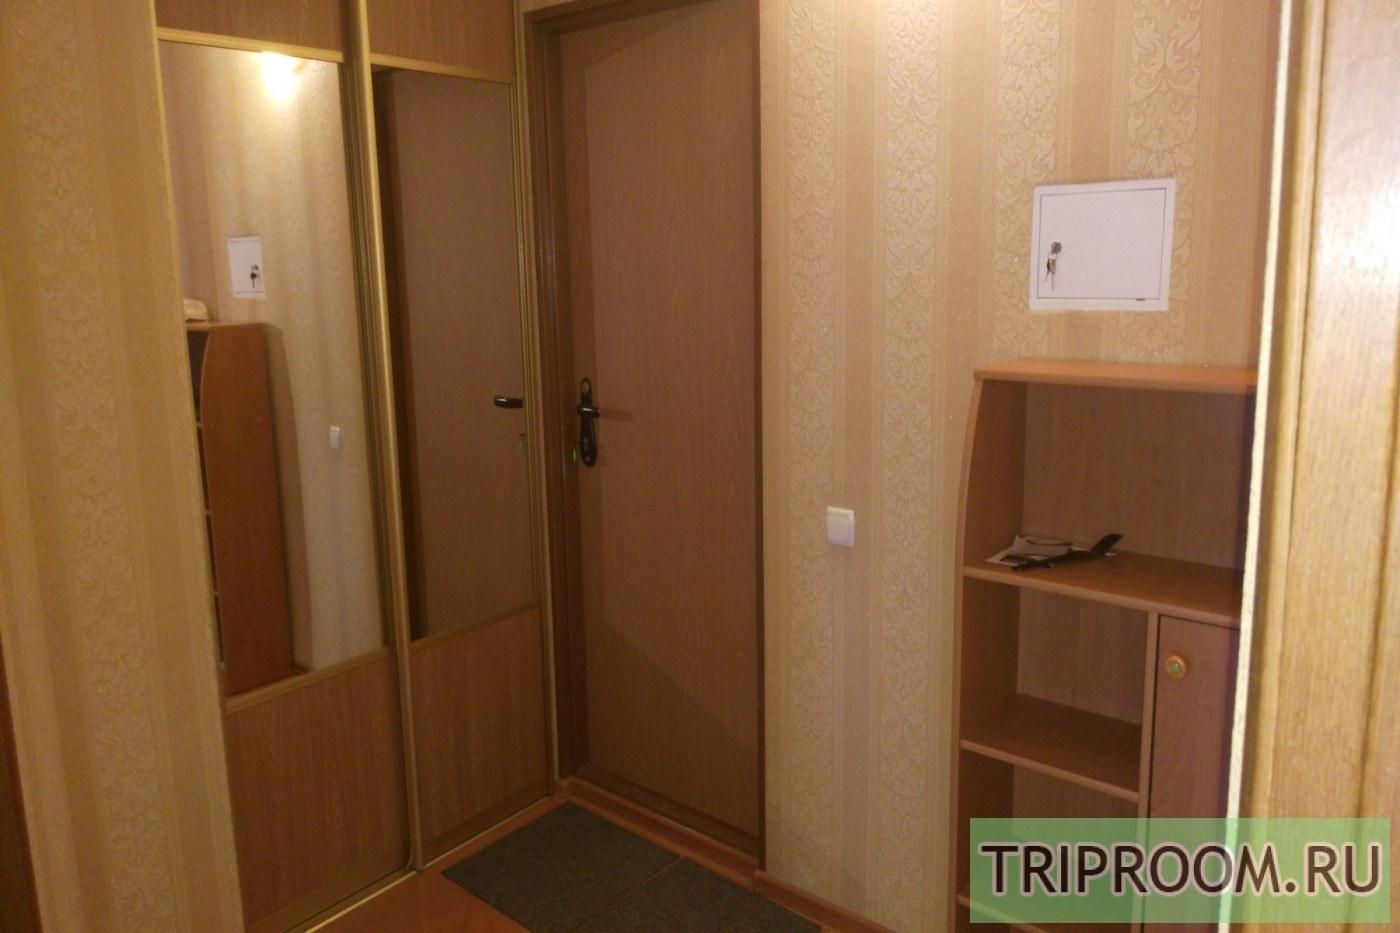 1-комнатная квартира посуточно (вариант № 38995), ул. Лексина улица, фото № 7